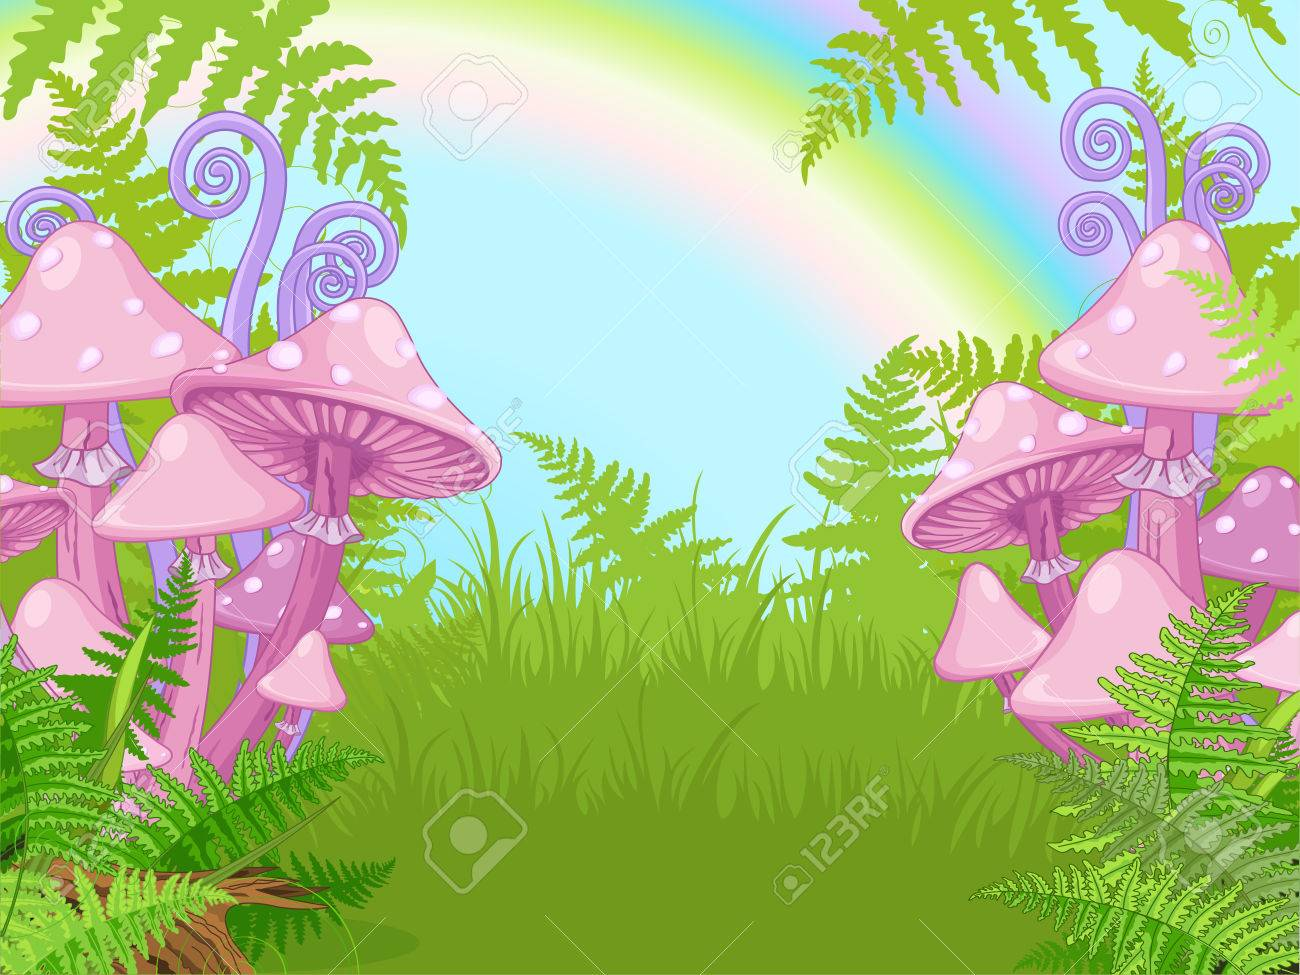 Fantasy landscape with mushrooms, fern, rainbow - 51376297